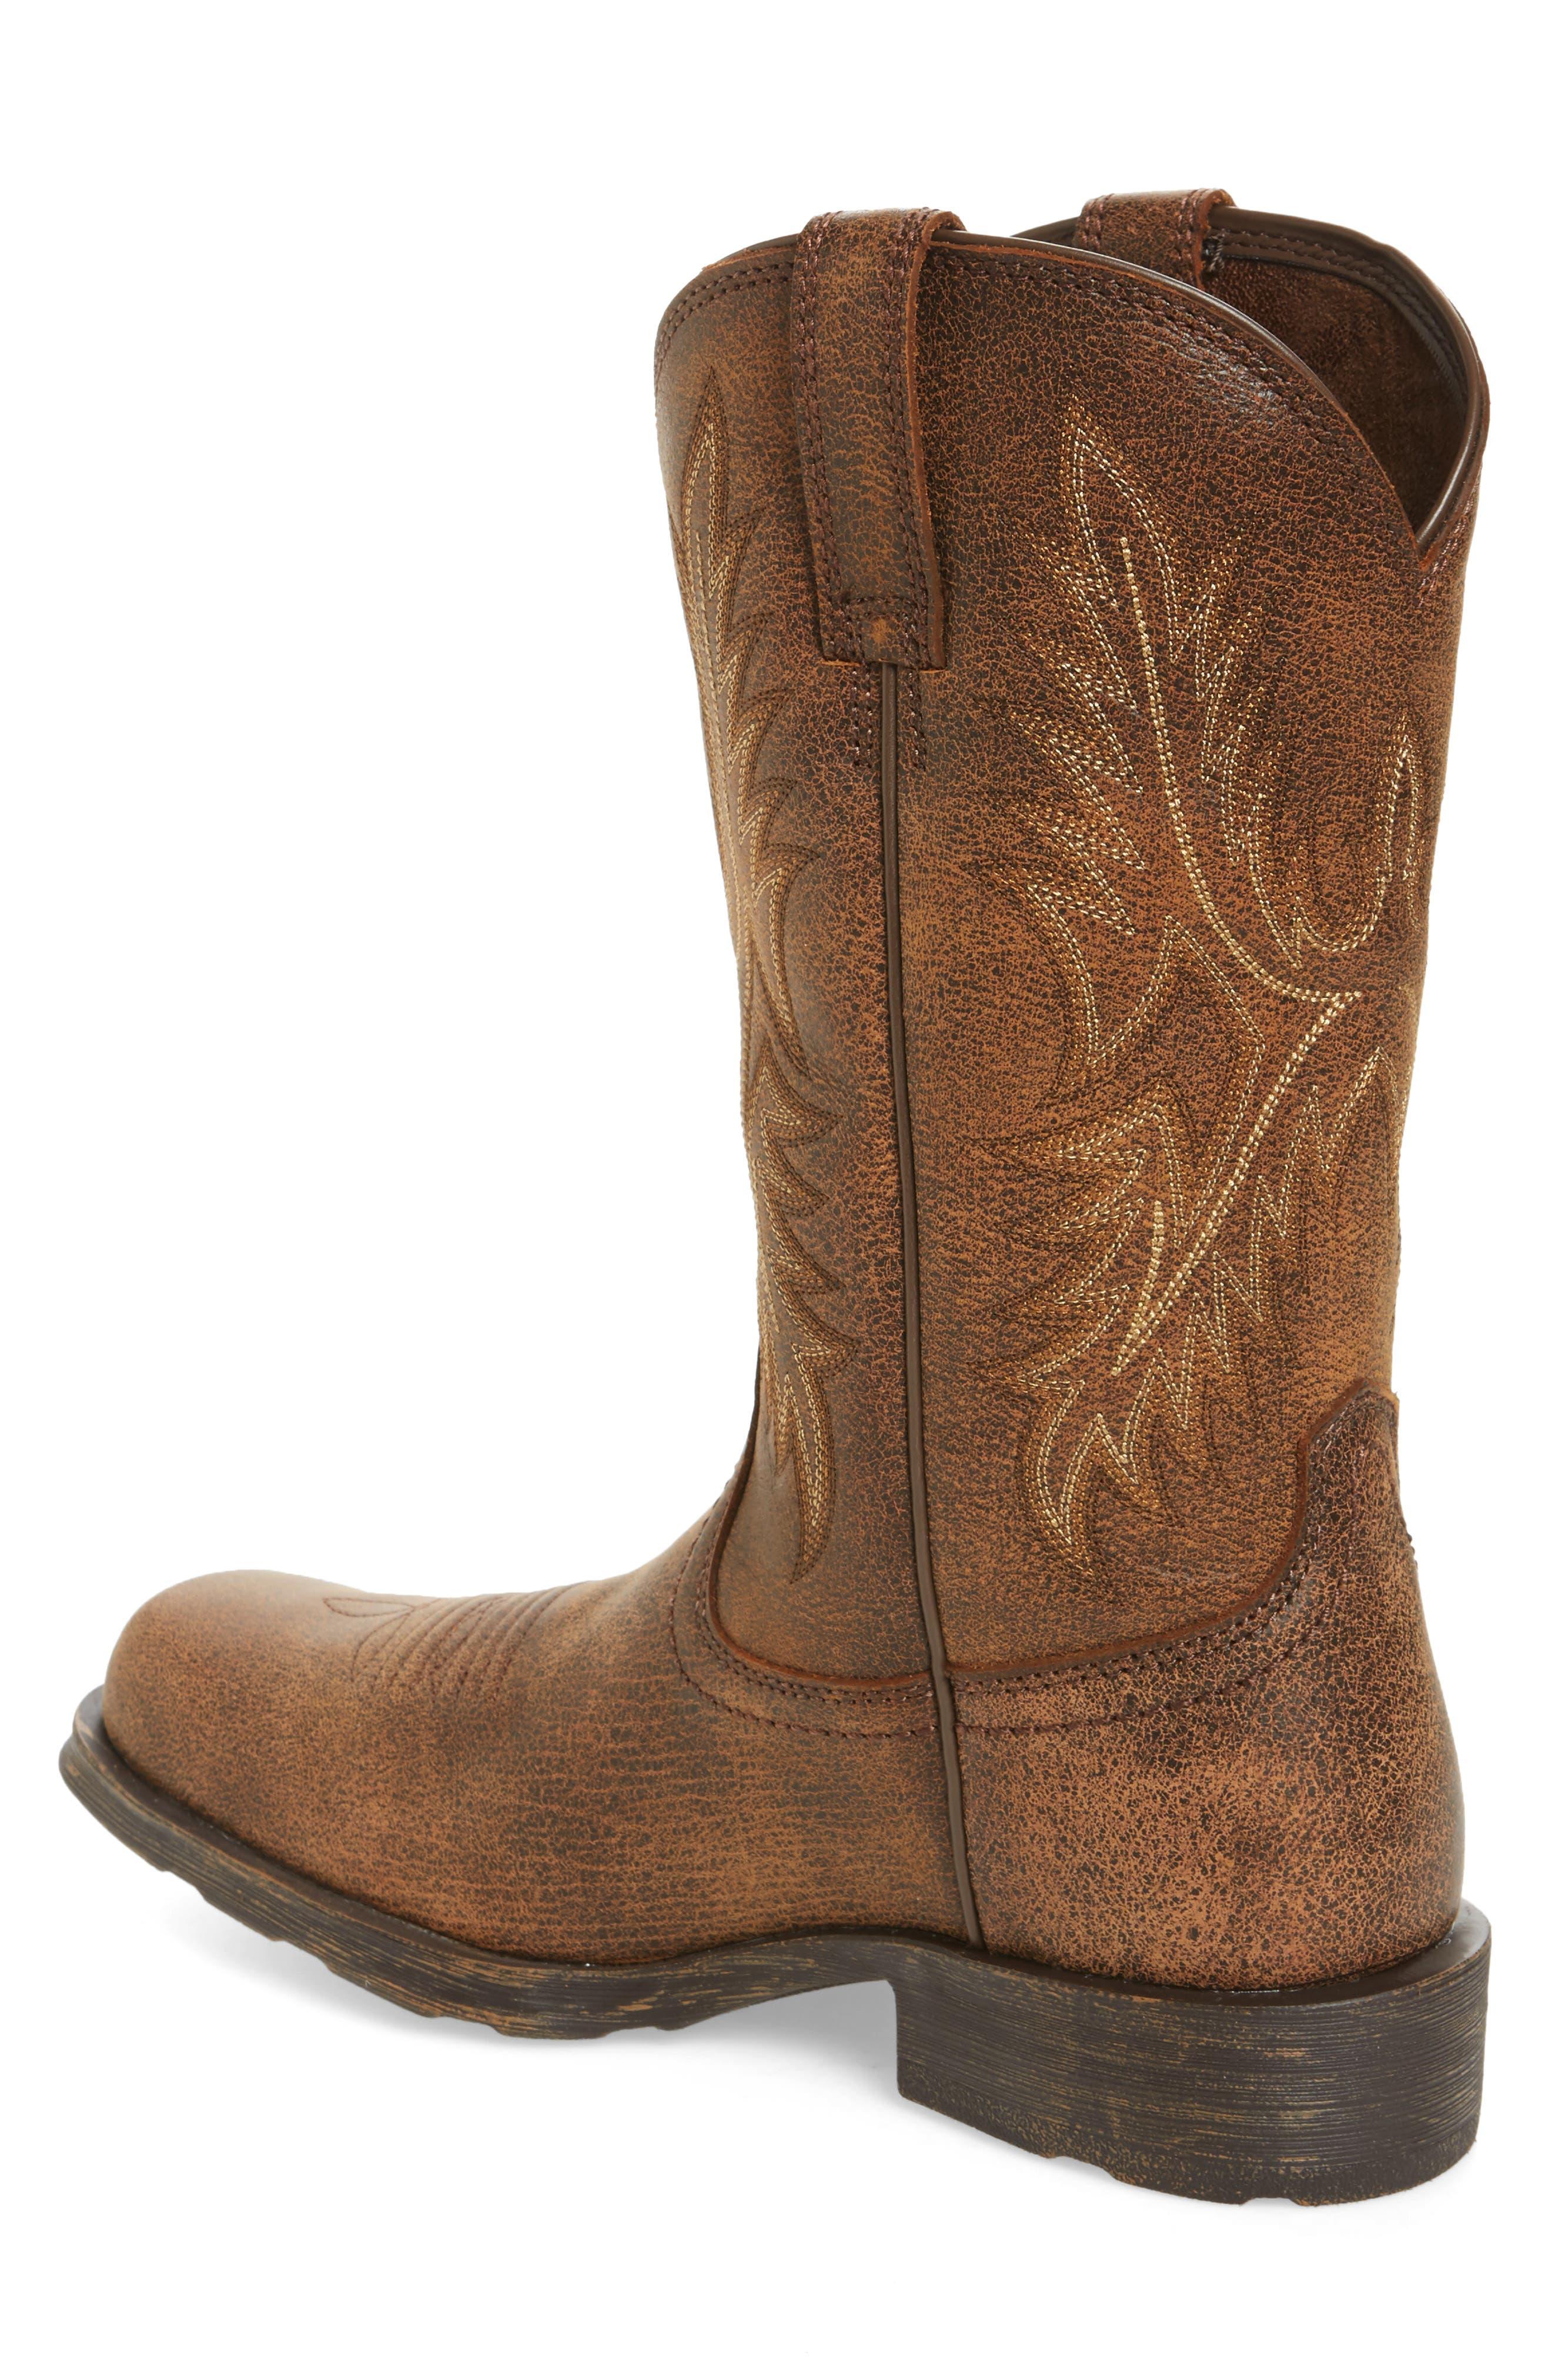 Western Rambler Cowboy Boot,                             Alternate thumbnail 2, color,                             200